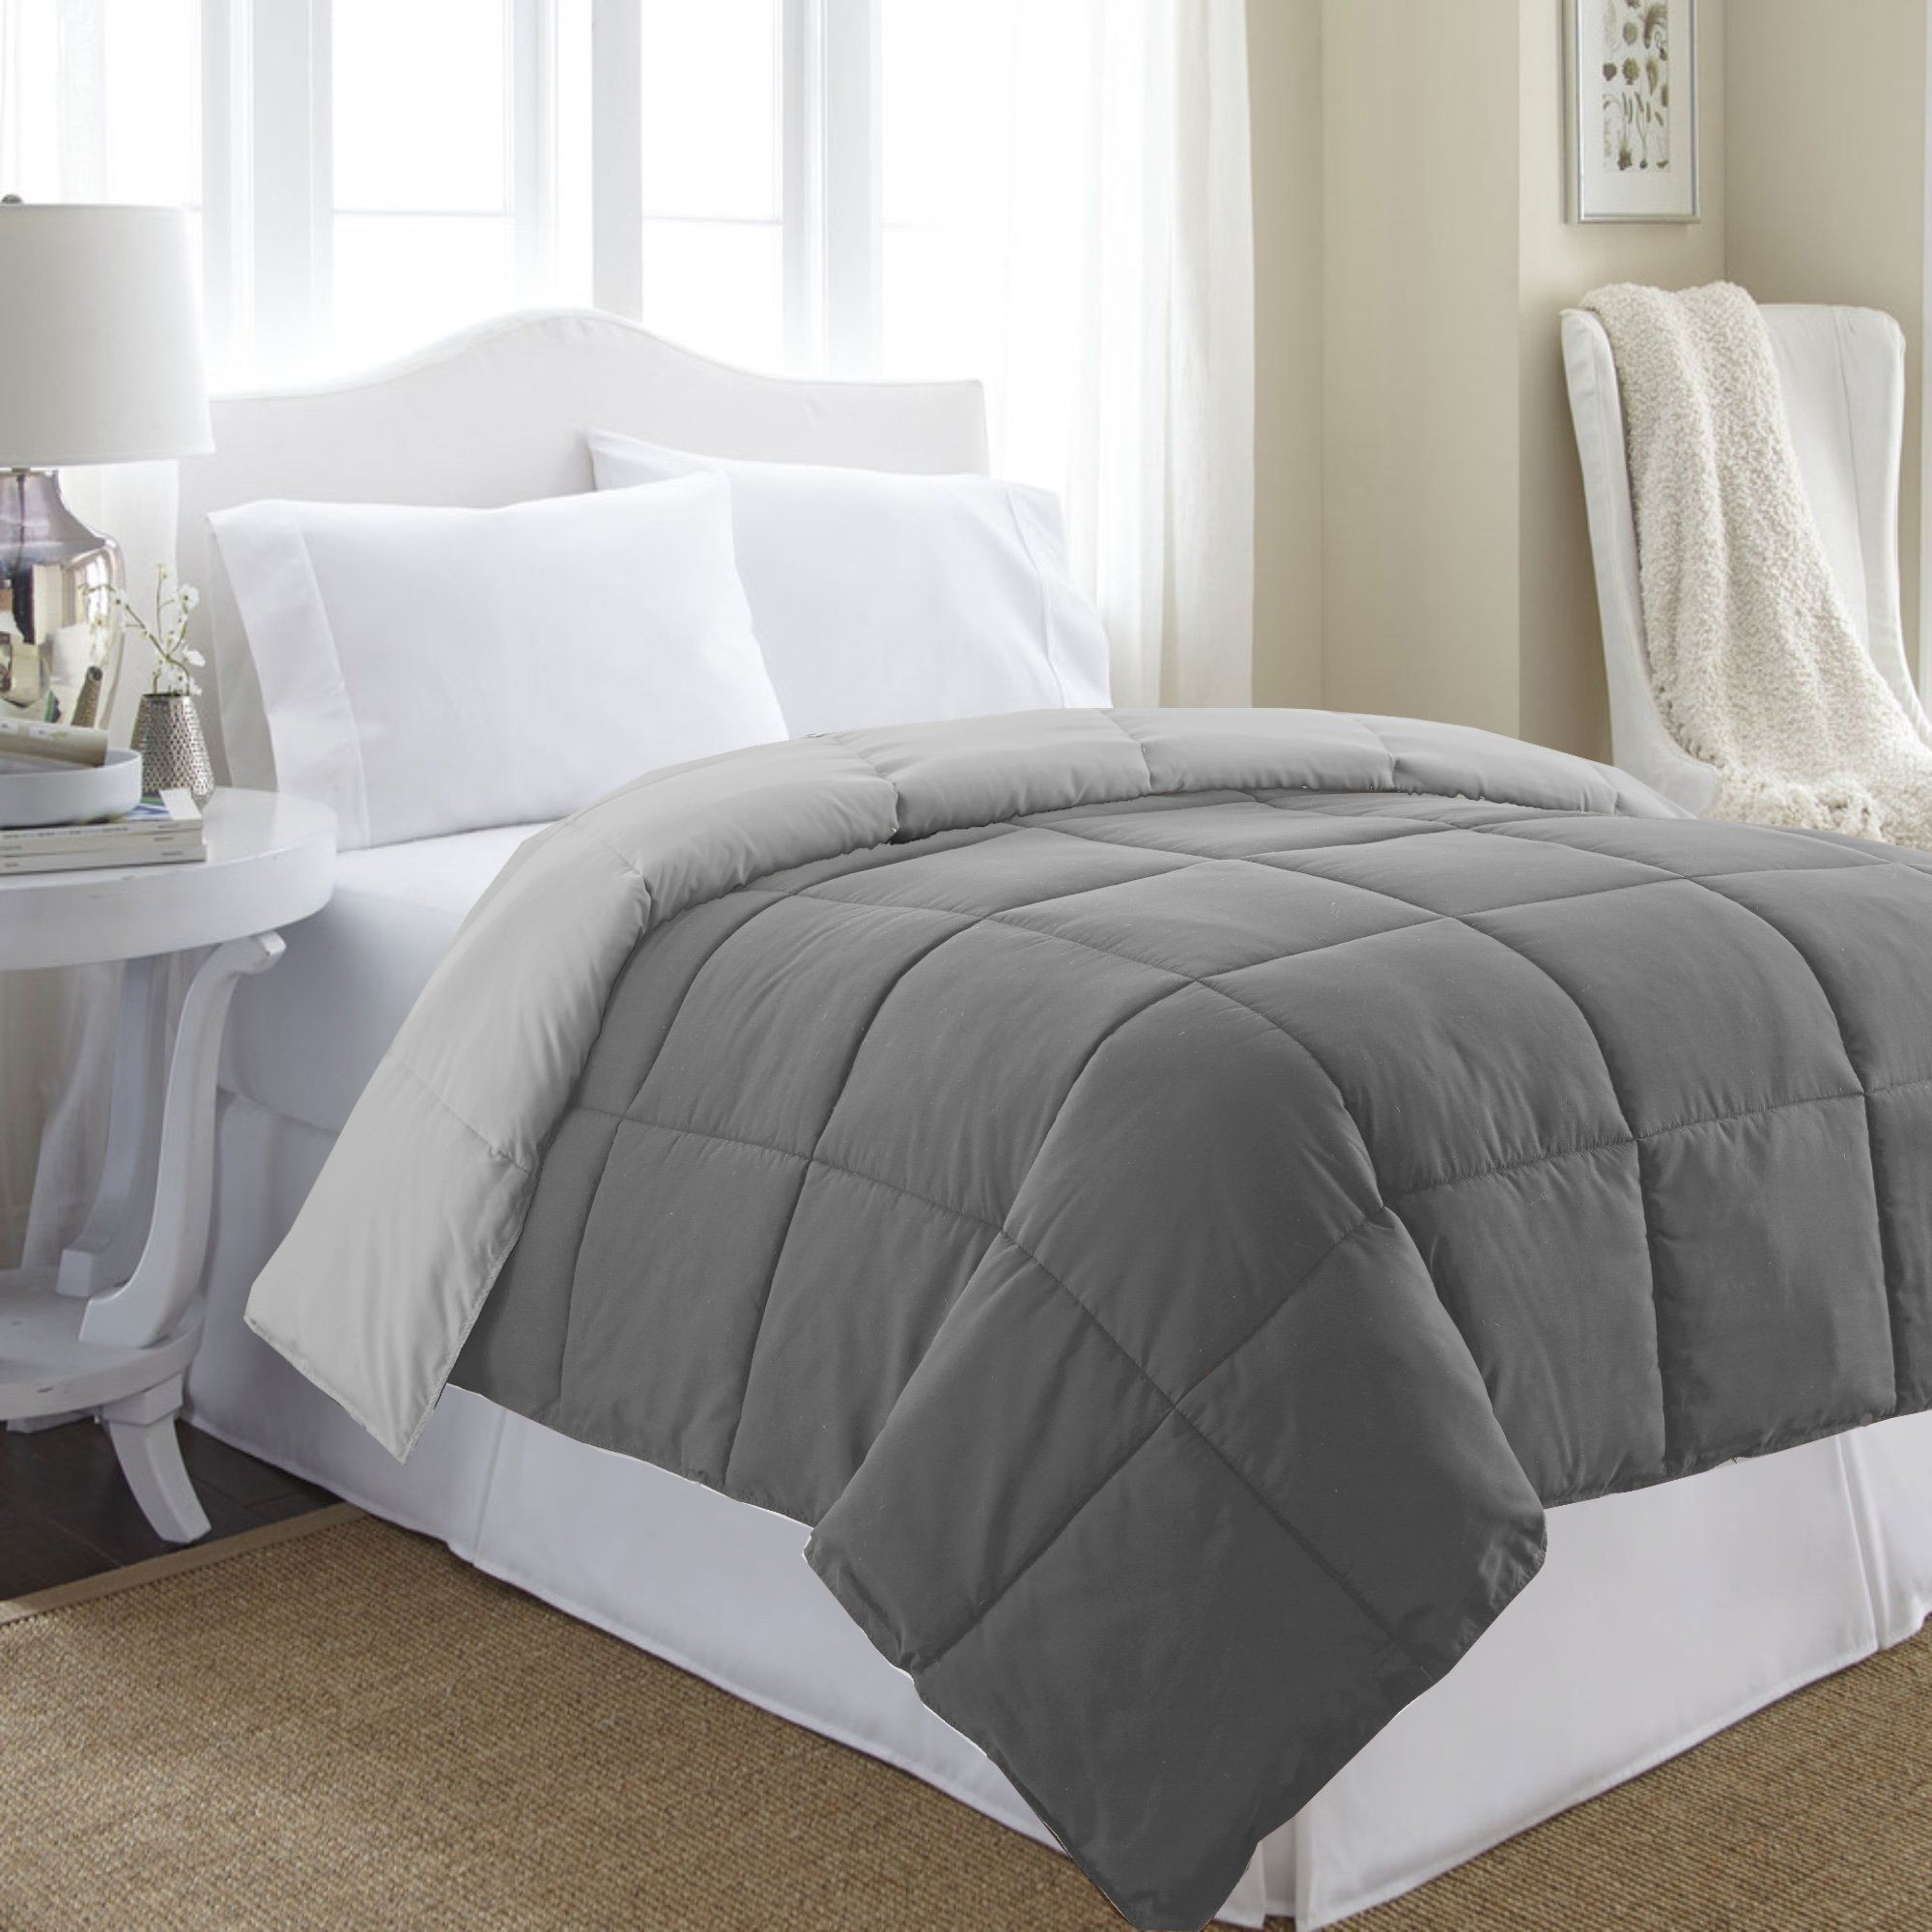 Amazon Puredown All Season White Down Alternative Comforter Trend